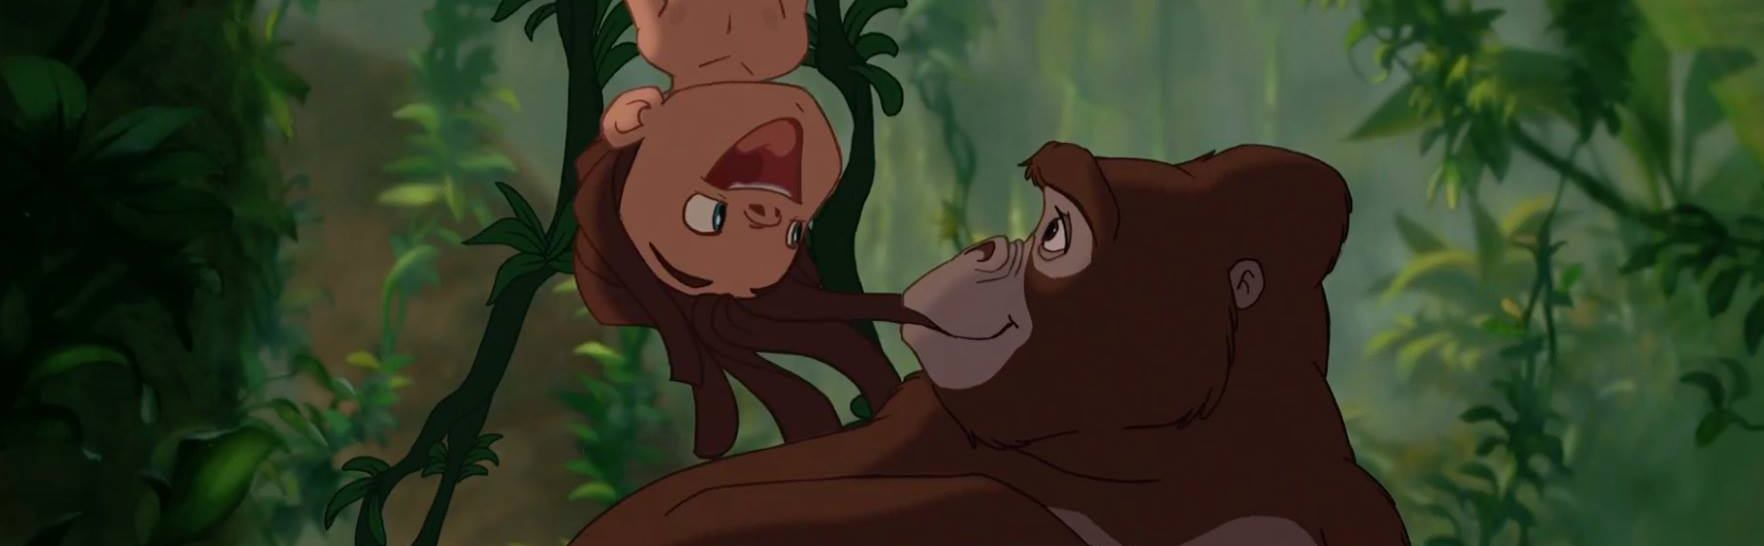 KRALJ DŽUNGLE Moderni Tarzan pokušao ući u zoološki vrt